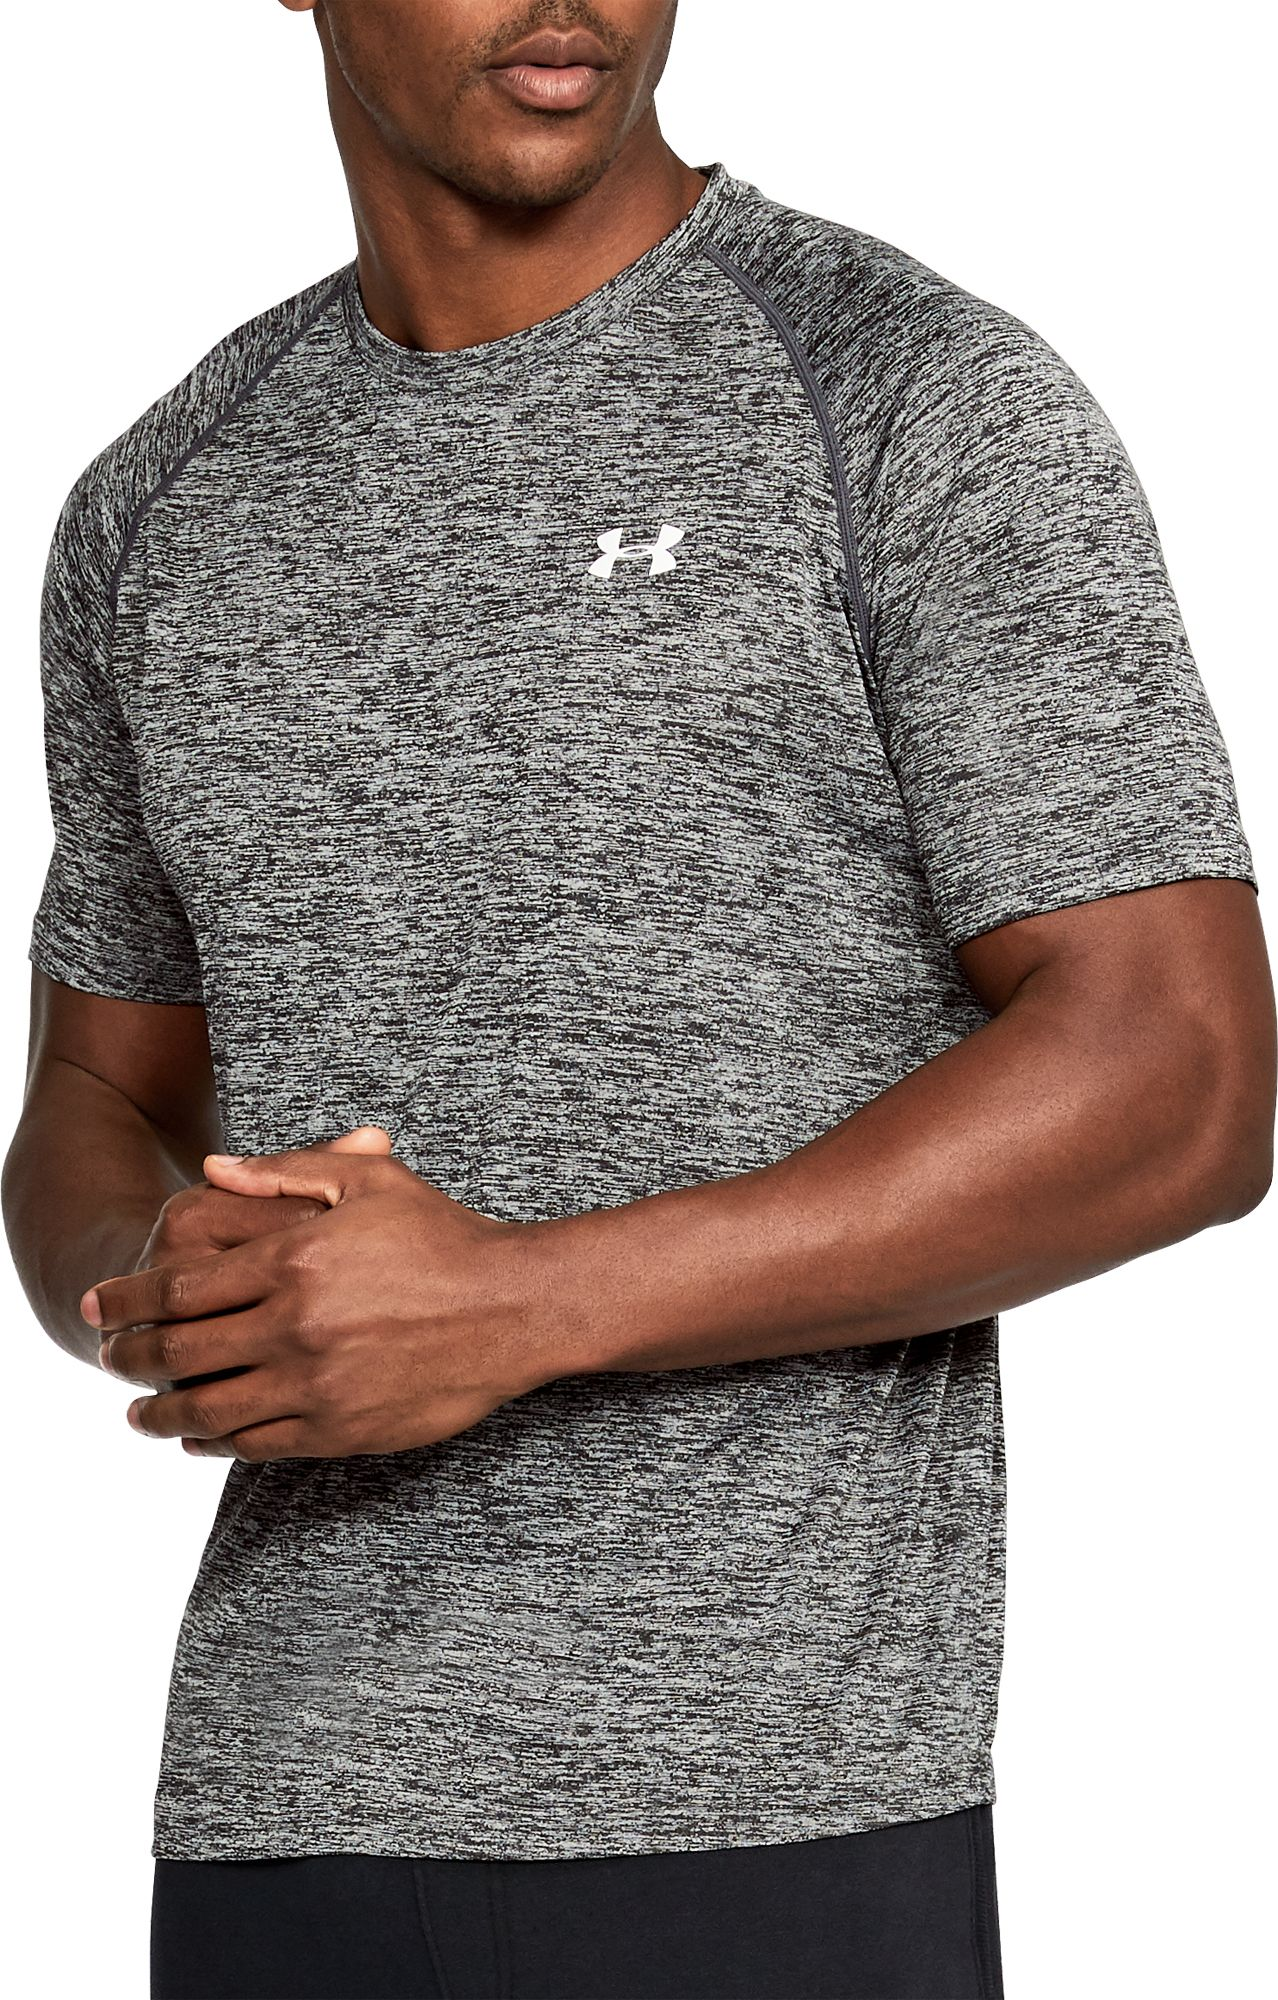 b73d8fd1c027 Under Armour Men's Tech T-Shirt | DICK'S Sporting GoodsProposition ...